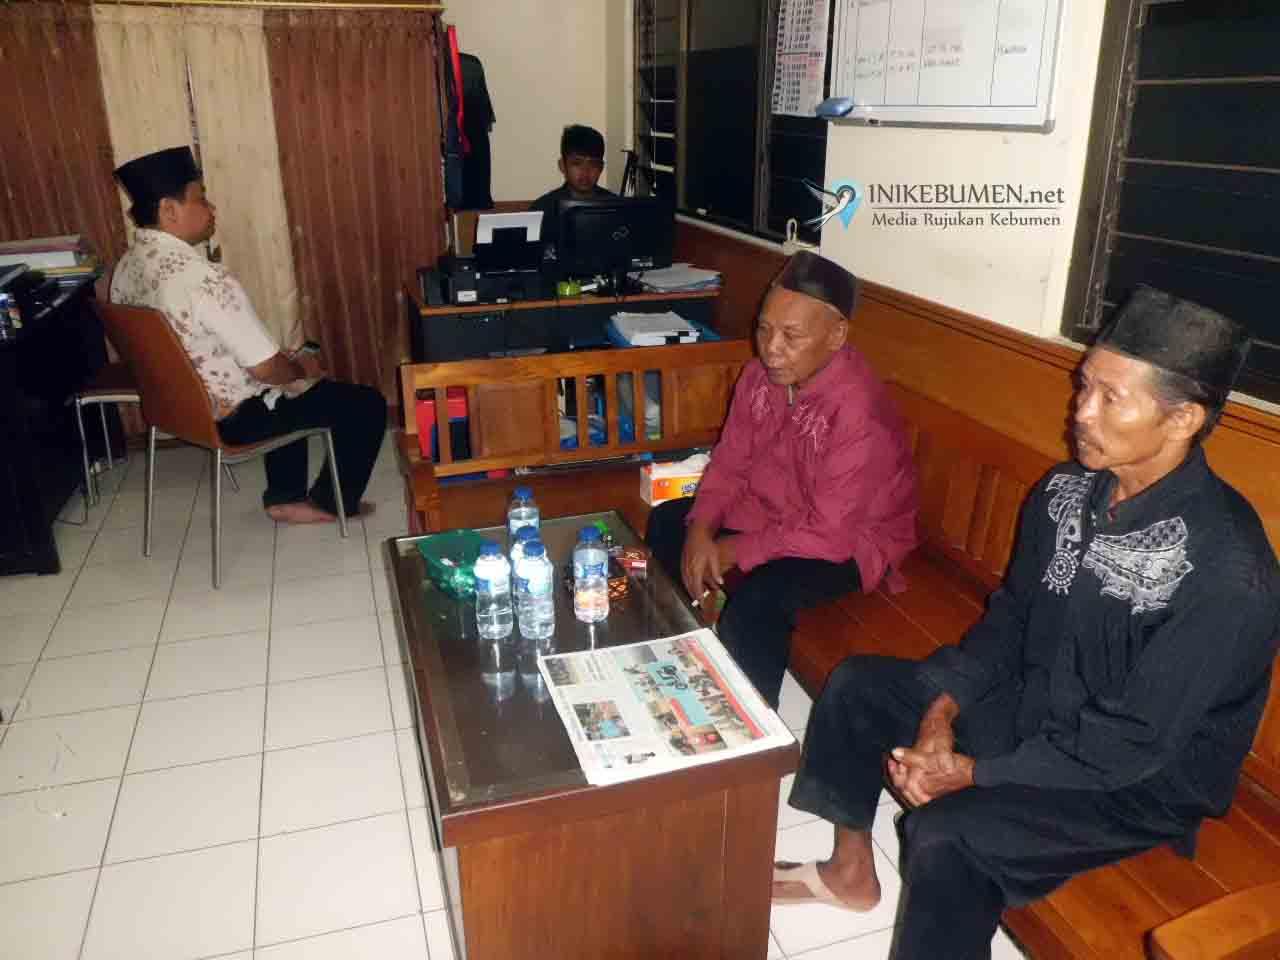 Diduga Menang karena  Muwur, Kades Terpilih Banjurpasar Dilaporkan ke Polisi